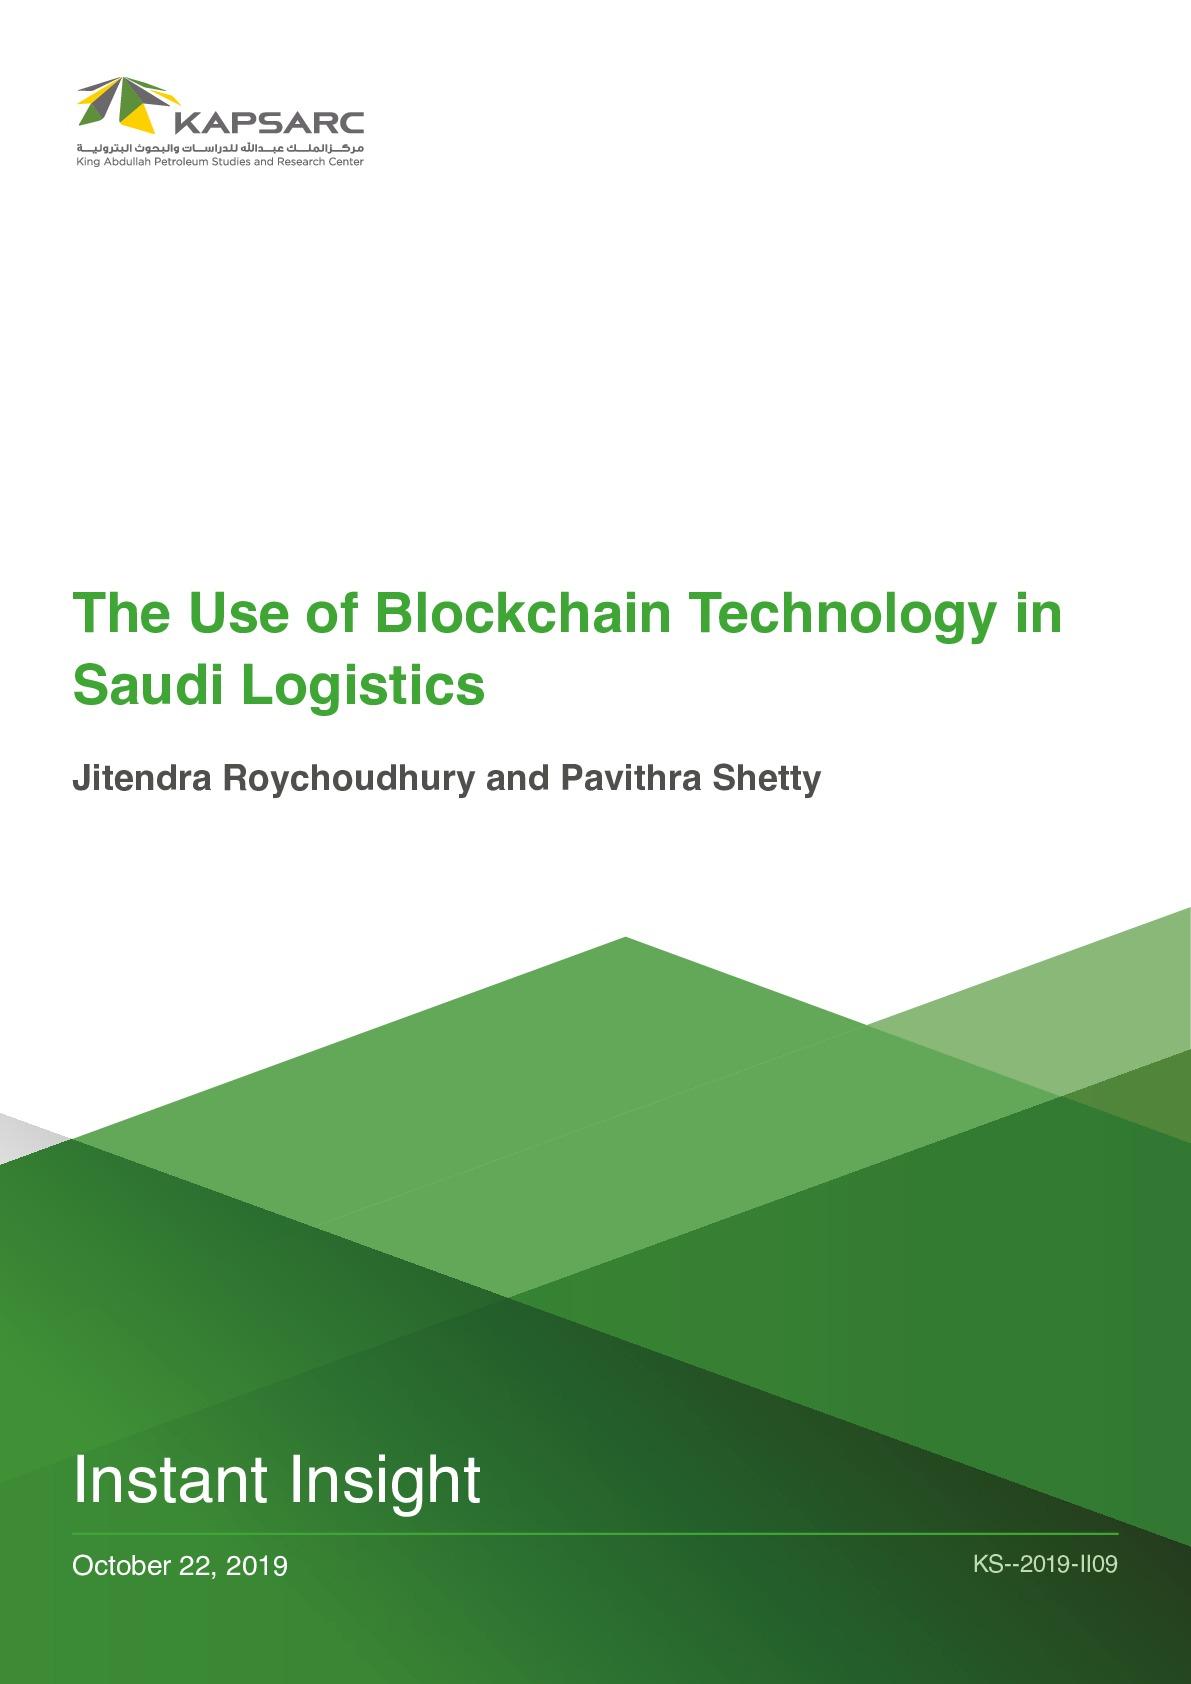 The Use of Blockchain Technology in Saudi Logistics